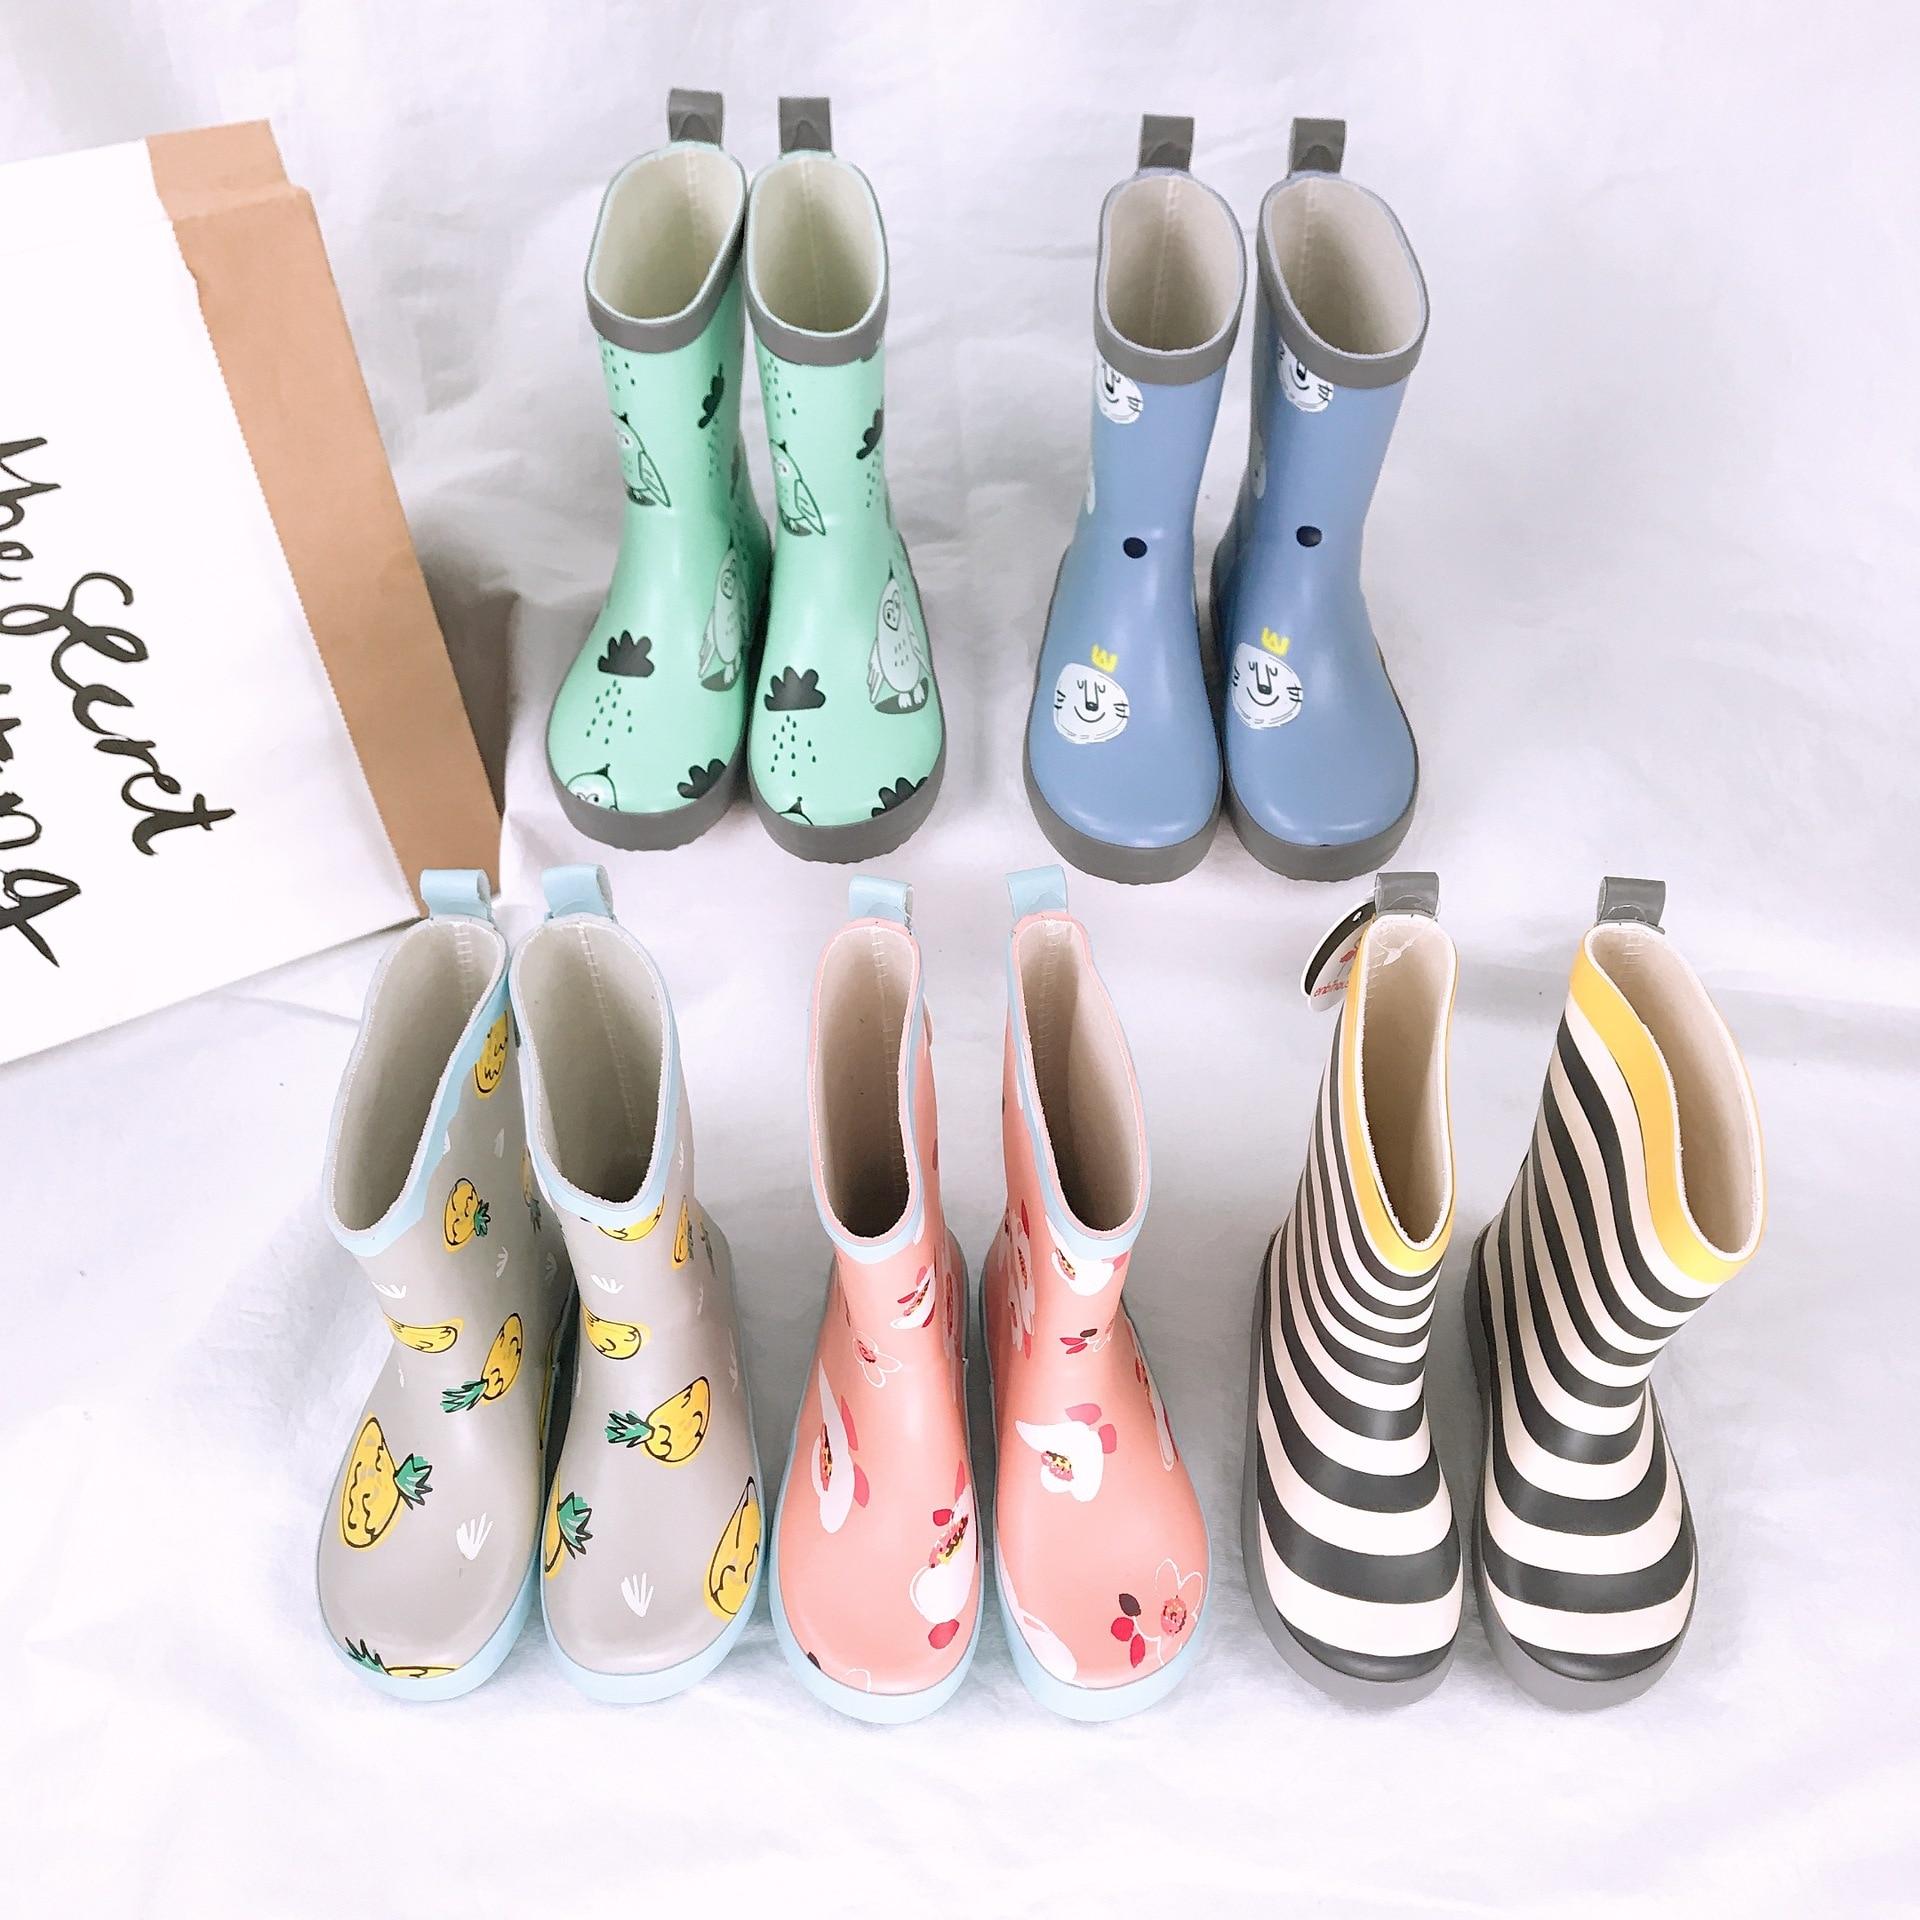 Celveroso Rain Boots Kids Girl Cute cartoon Printed Children's Rubber Boots Kalosze Dla Dzieci Waterproof Baby Water Shoes|Boots| |  - title=